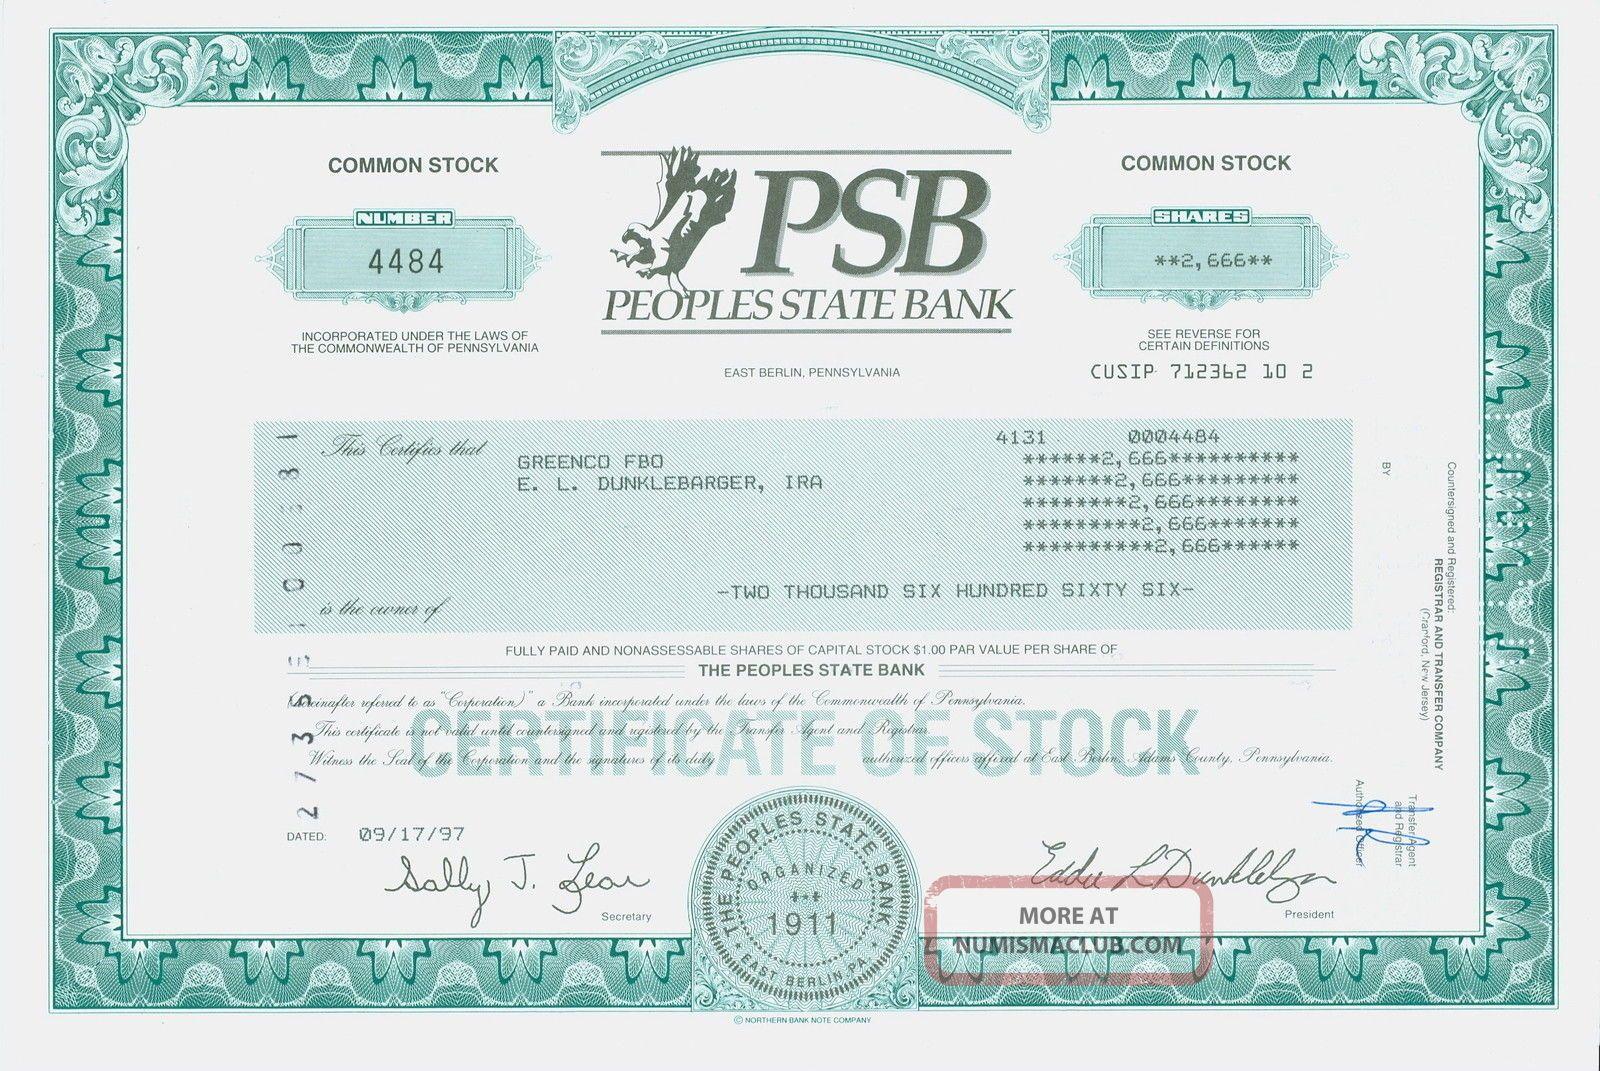 Stock Certificate - - Peoples State Bank – Psb,  East Berlin,  Pennsylvania Stocks & Bonds, Scripophily photo